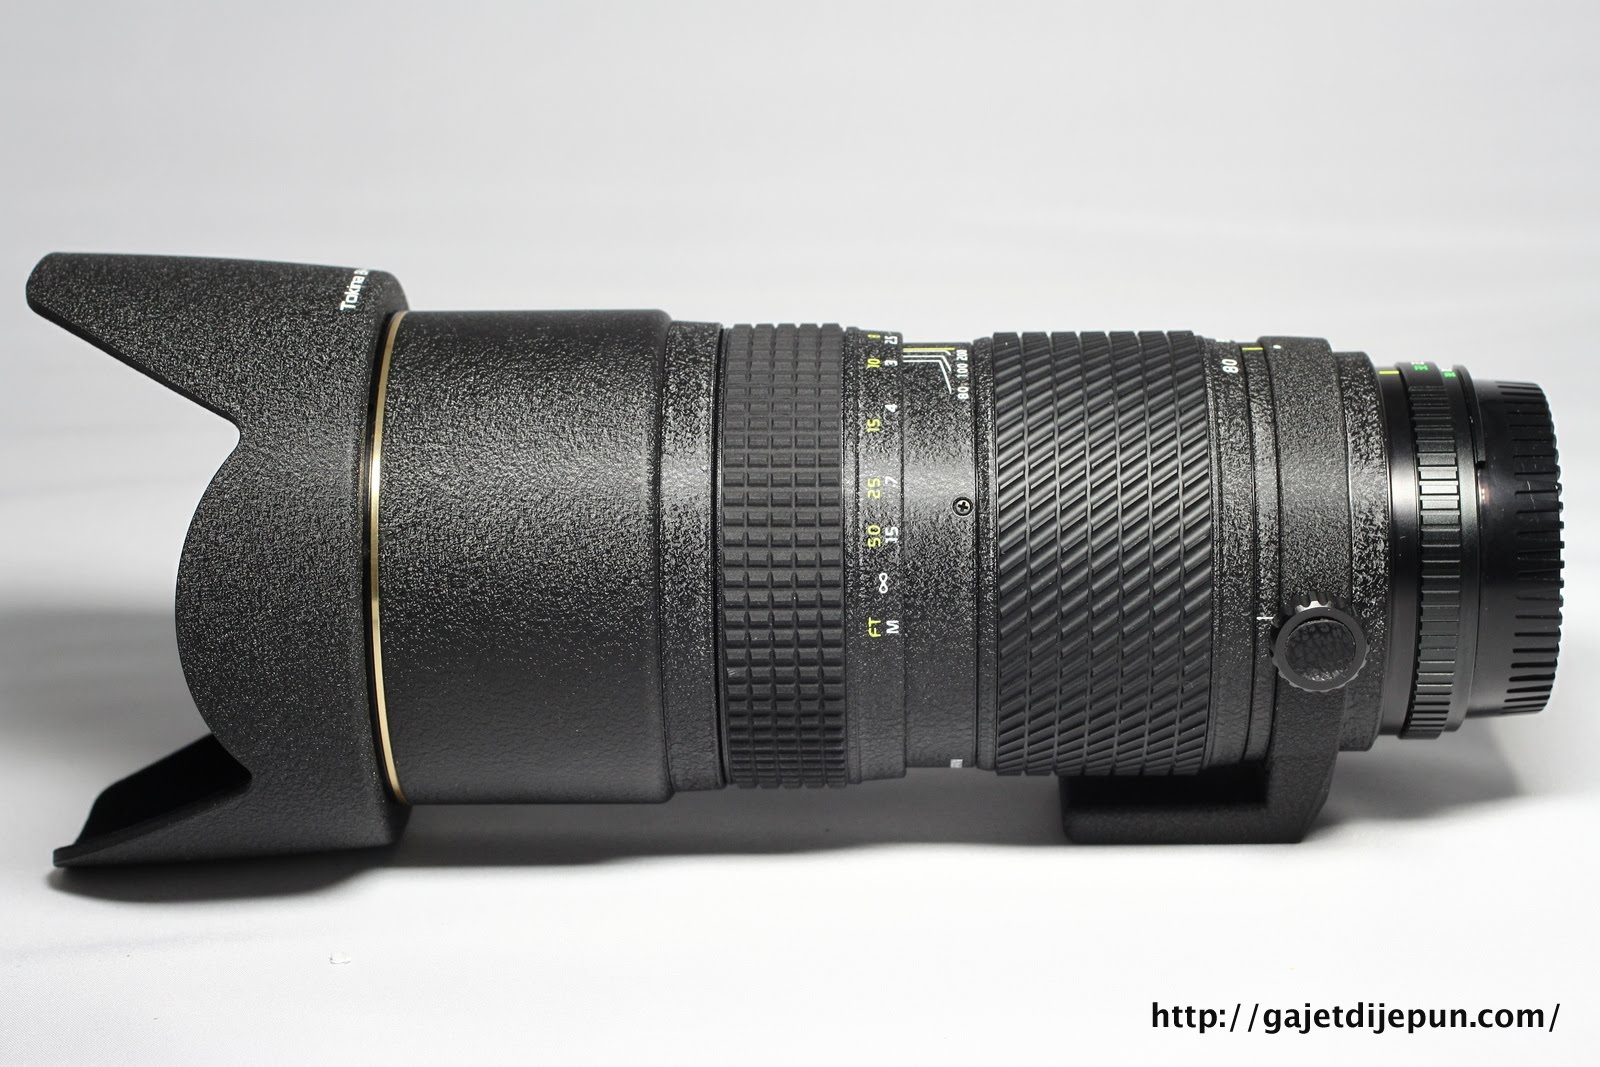 SOLD] Tokina AT-X 828 AF Pro 80-200mm f/2.8 II SD (Nikon) [a253]